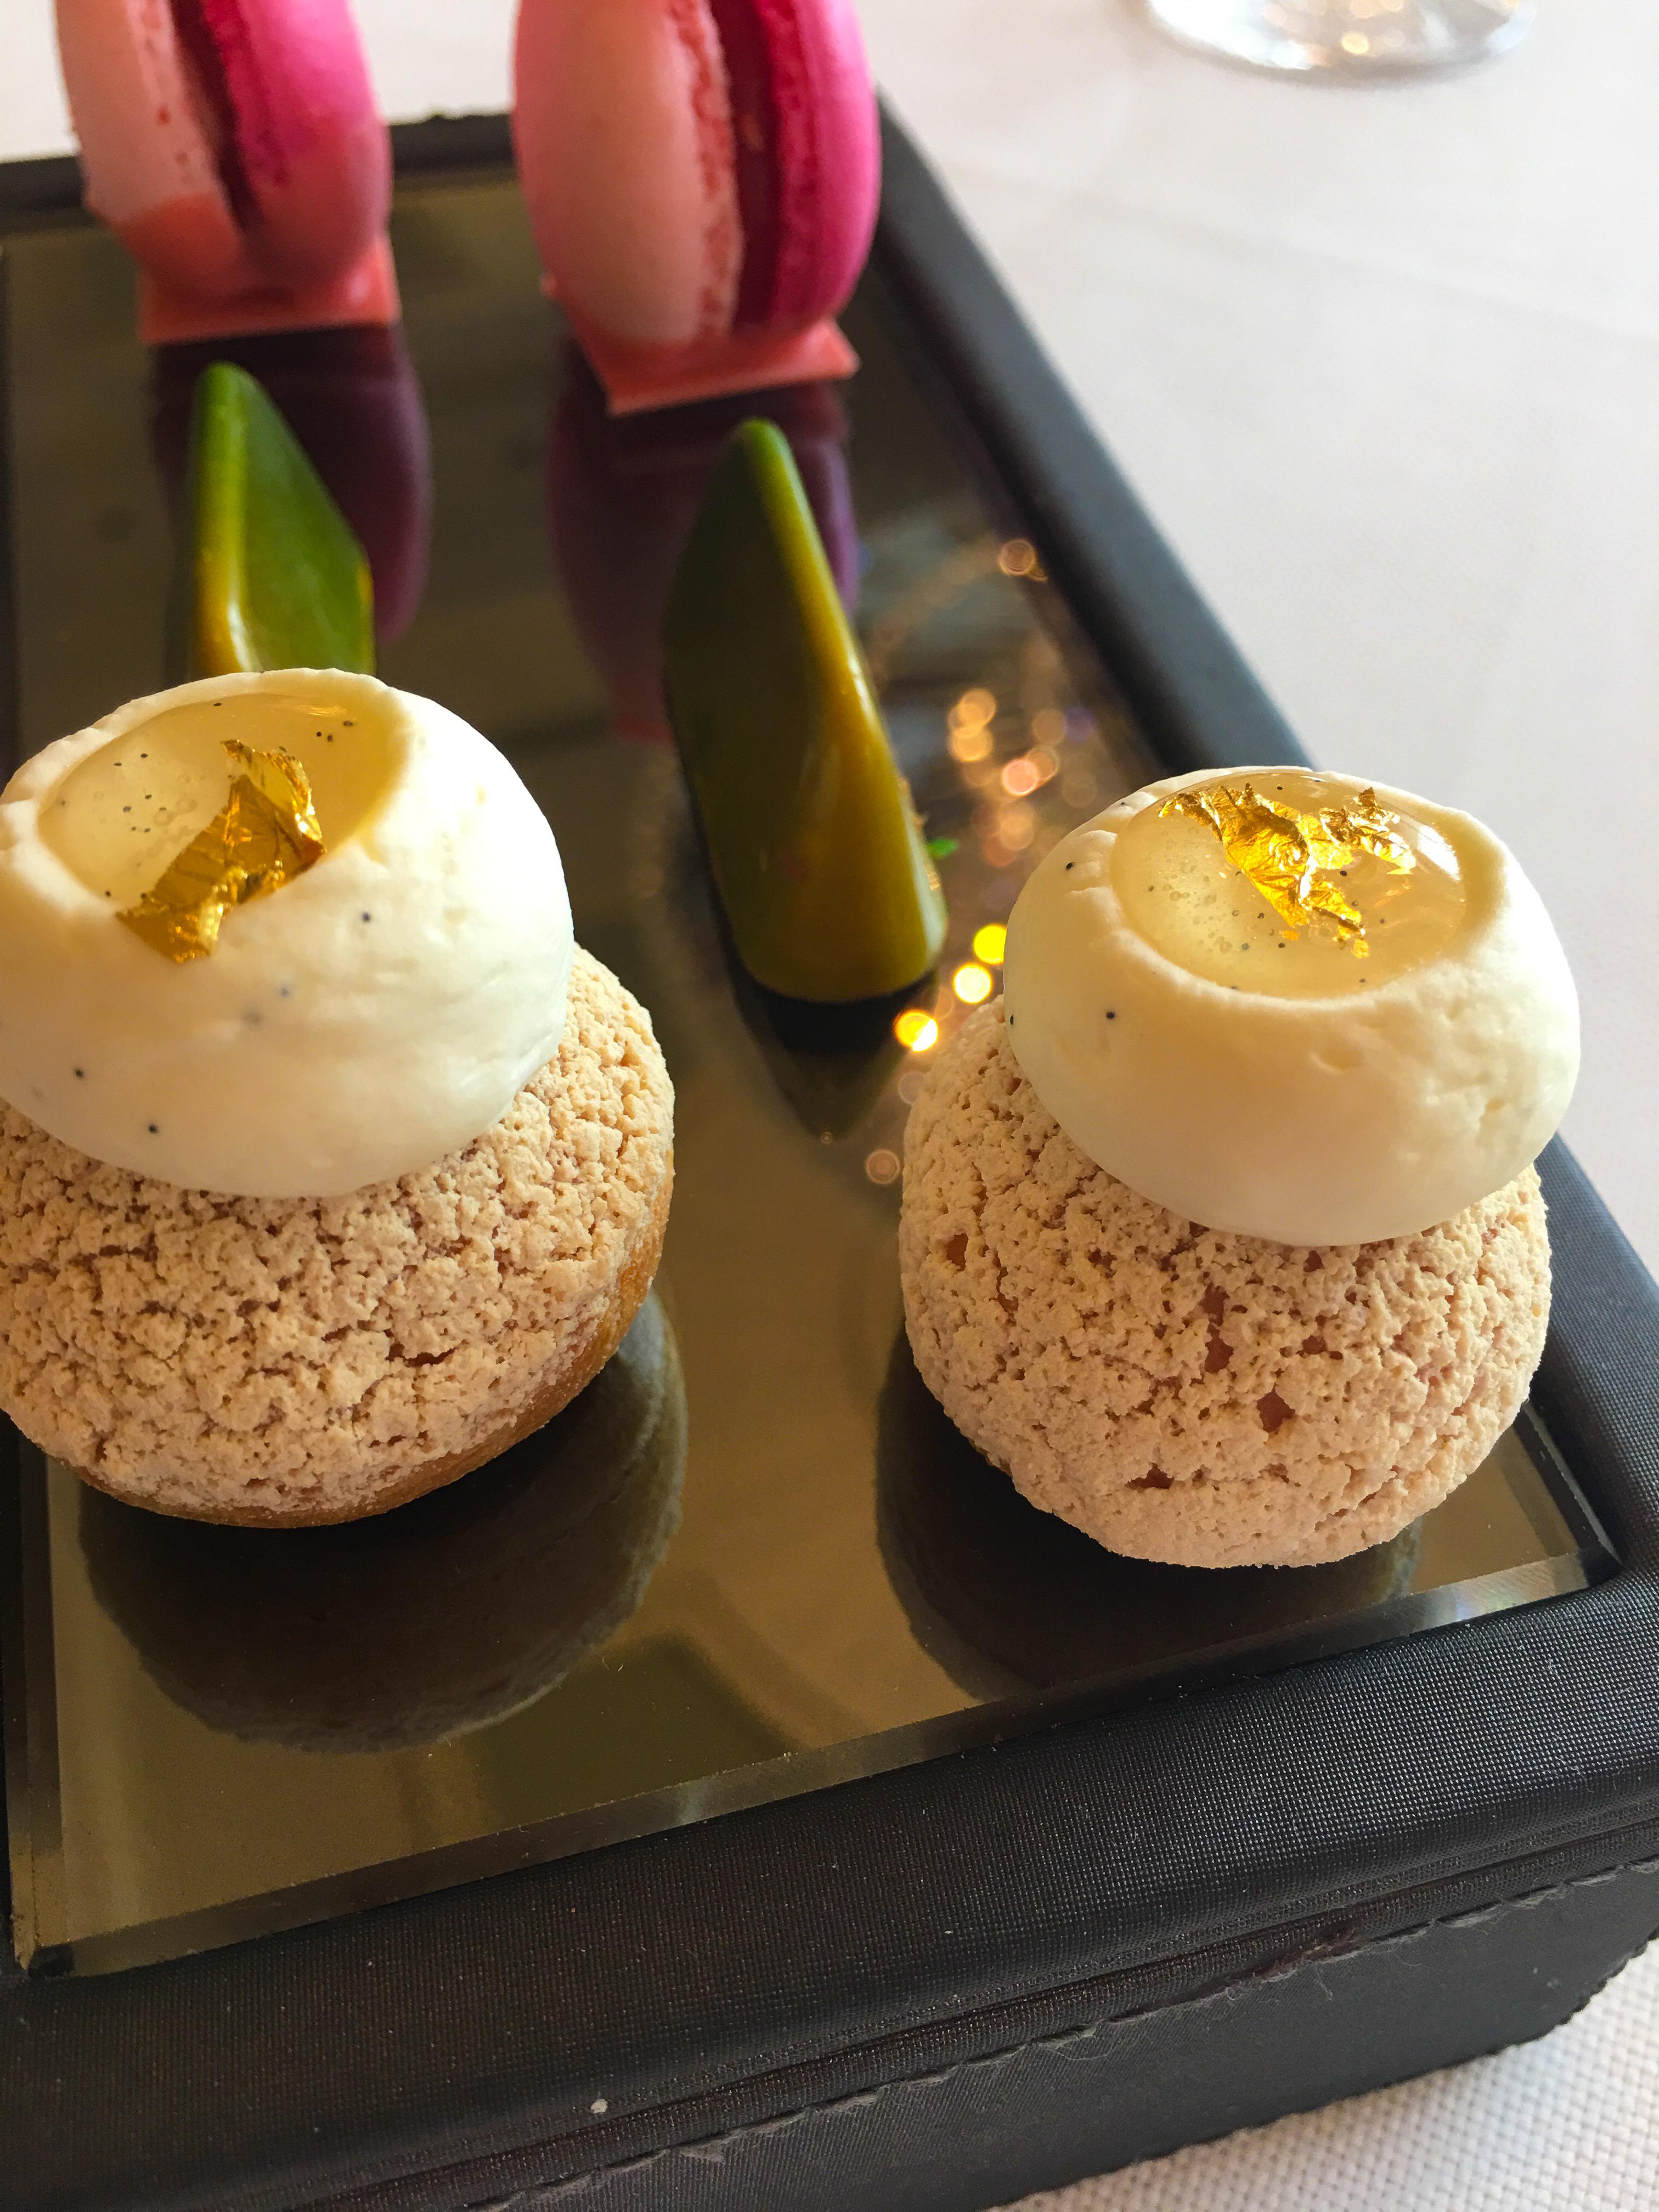 Desserts at Caprice